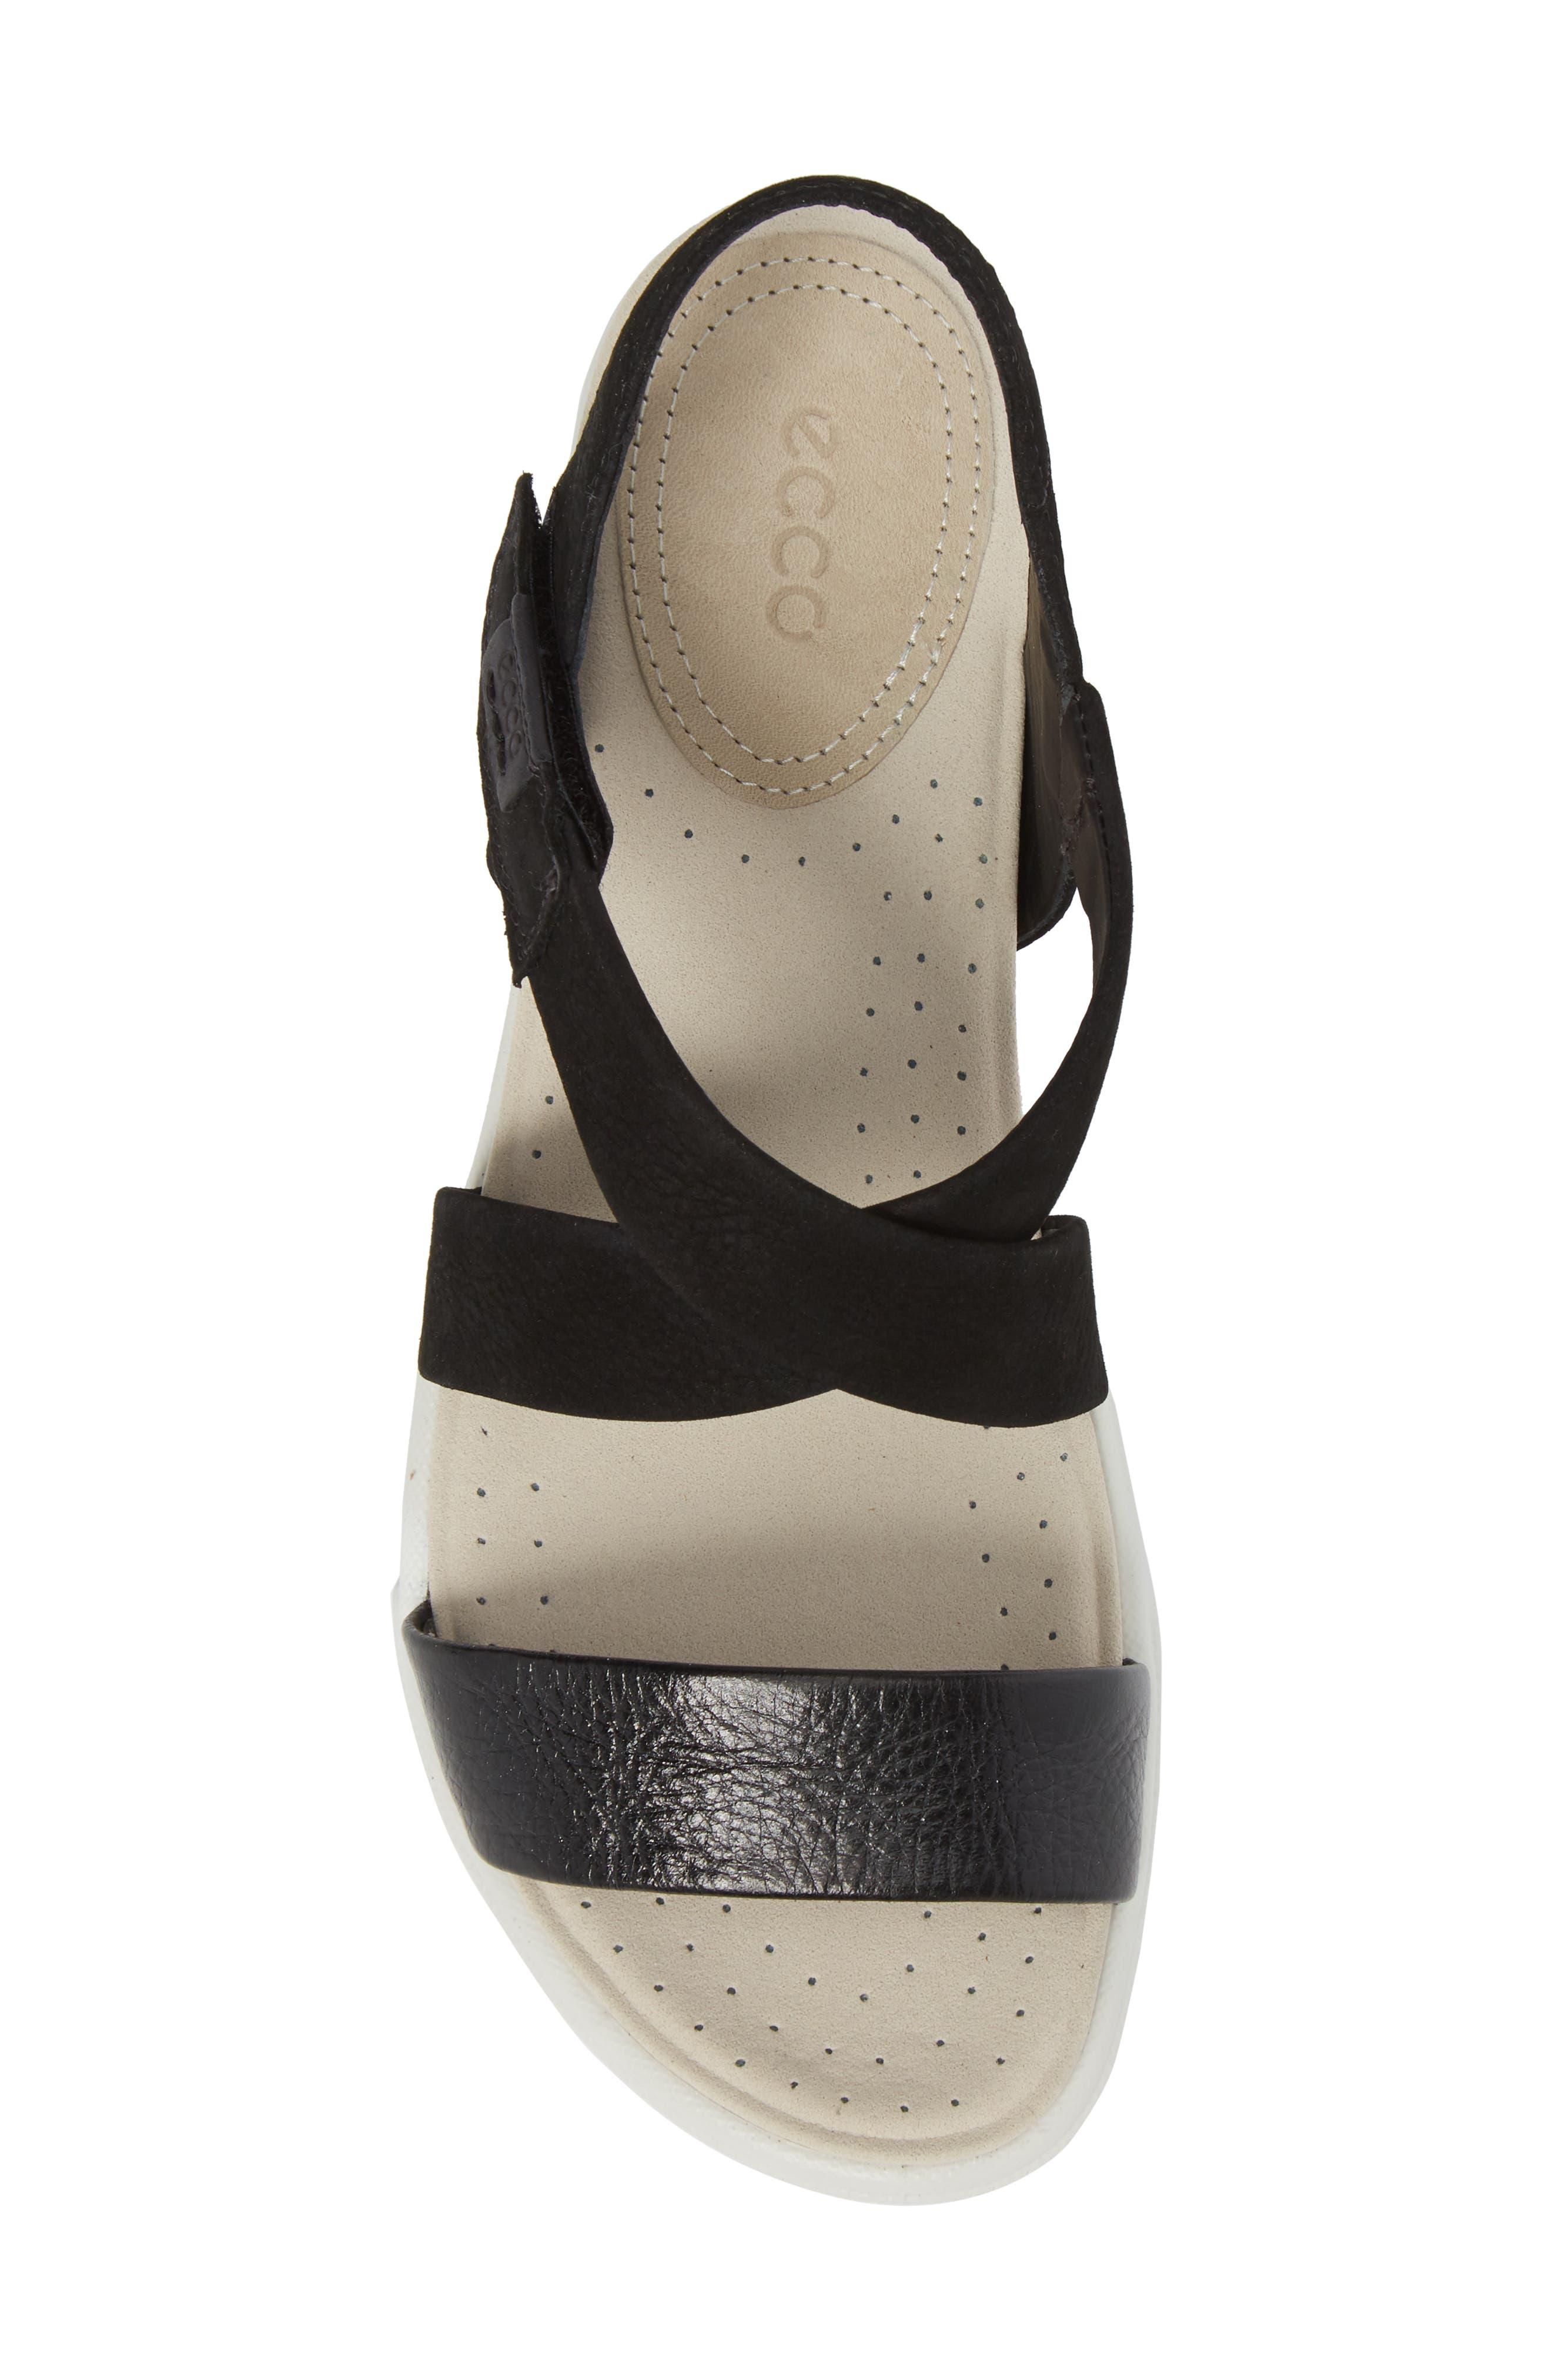 Damara Cross-Strap Sandal,                             Alternate thumbnail 5, color,                             Black Leather